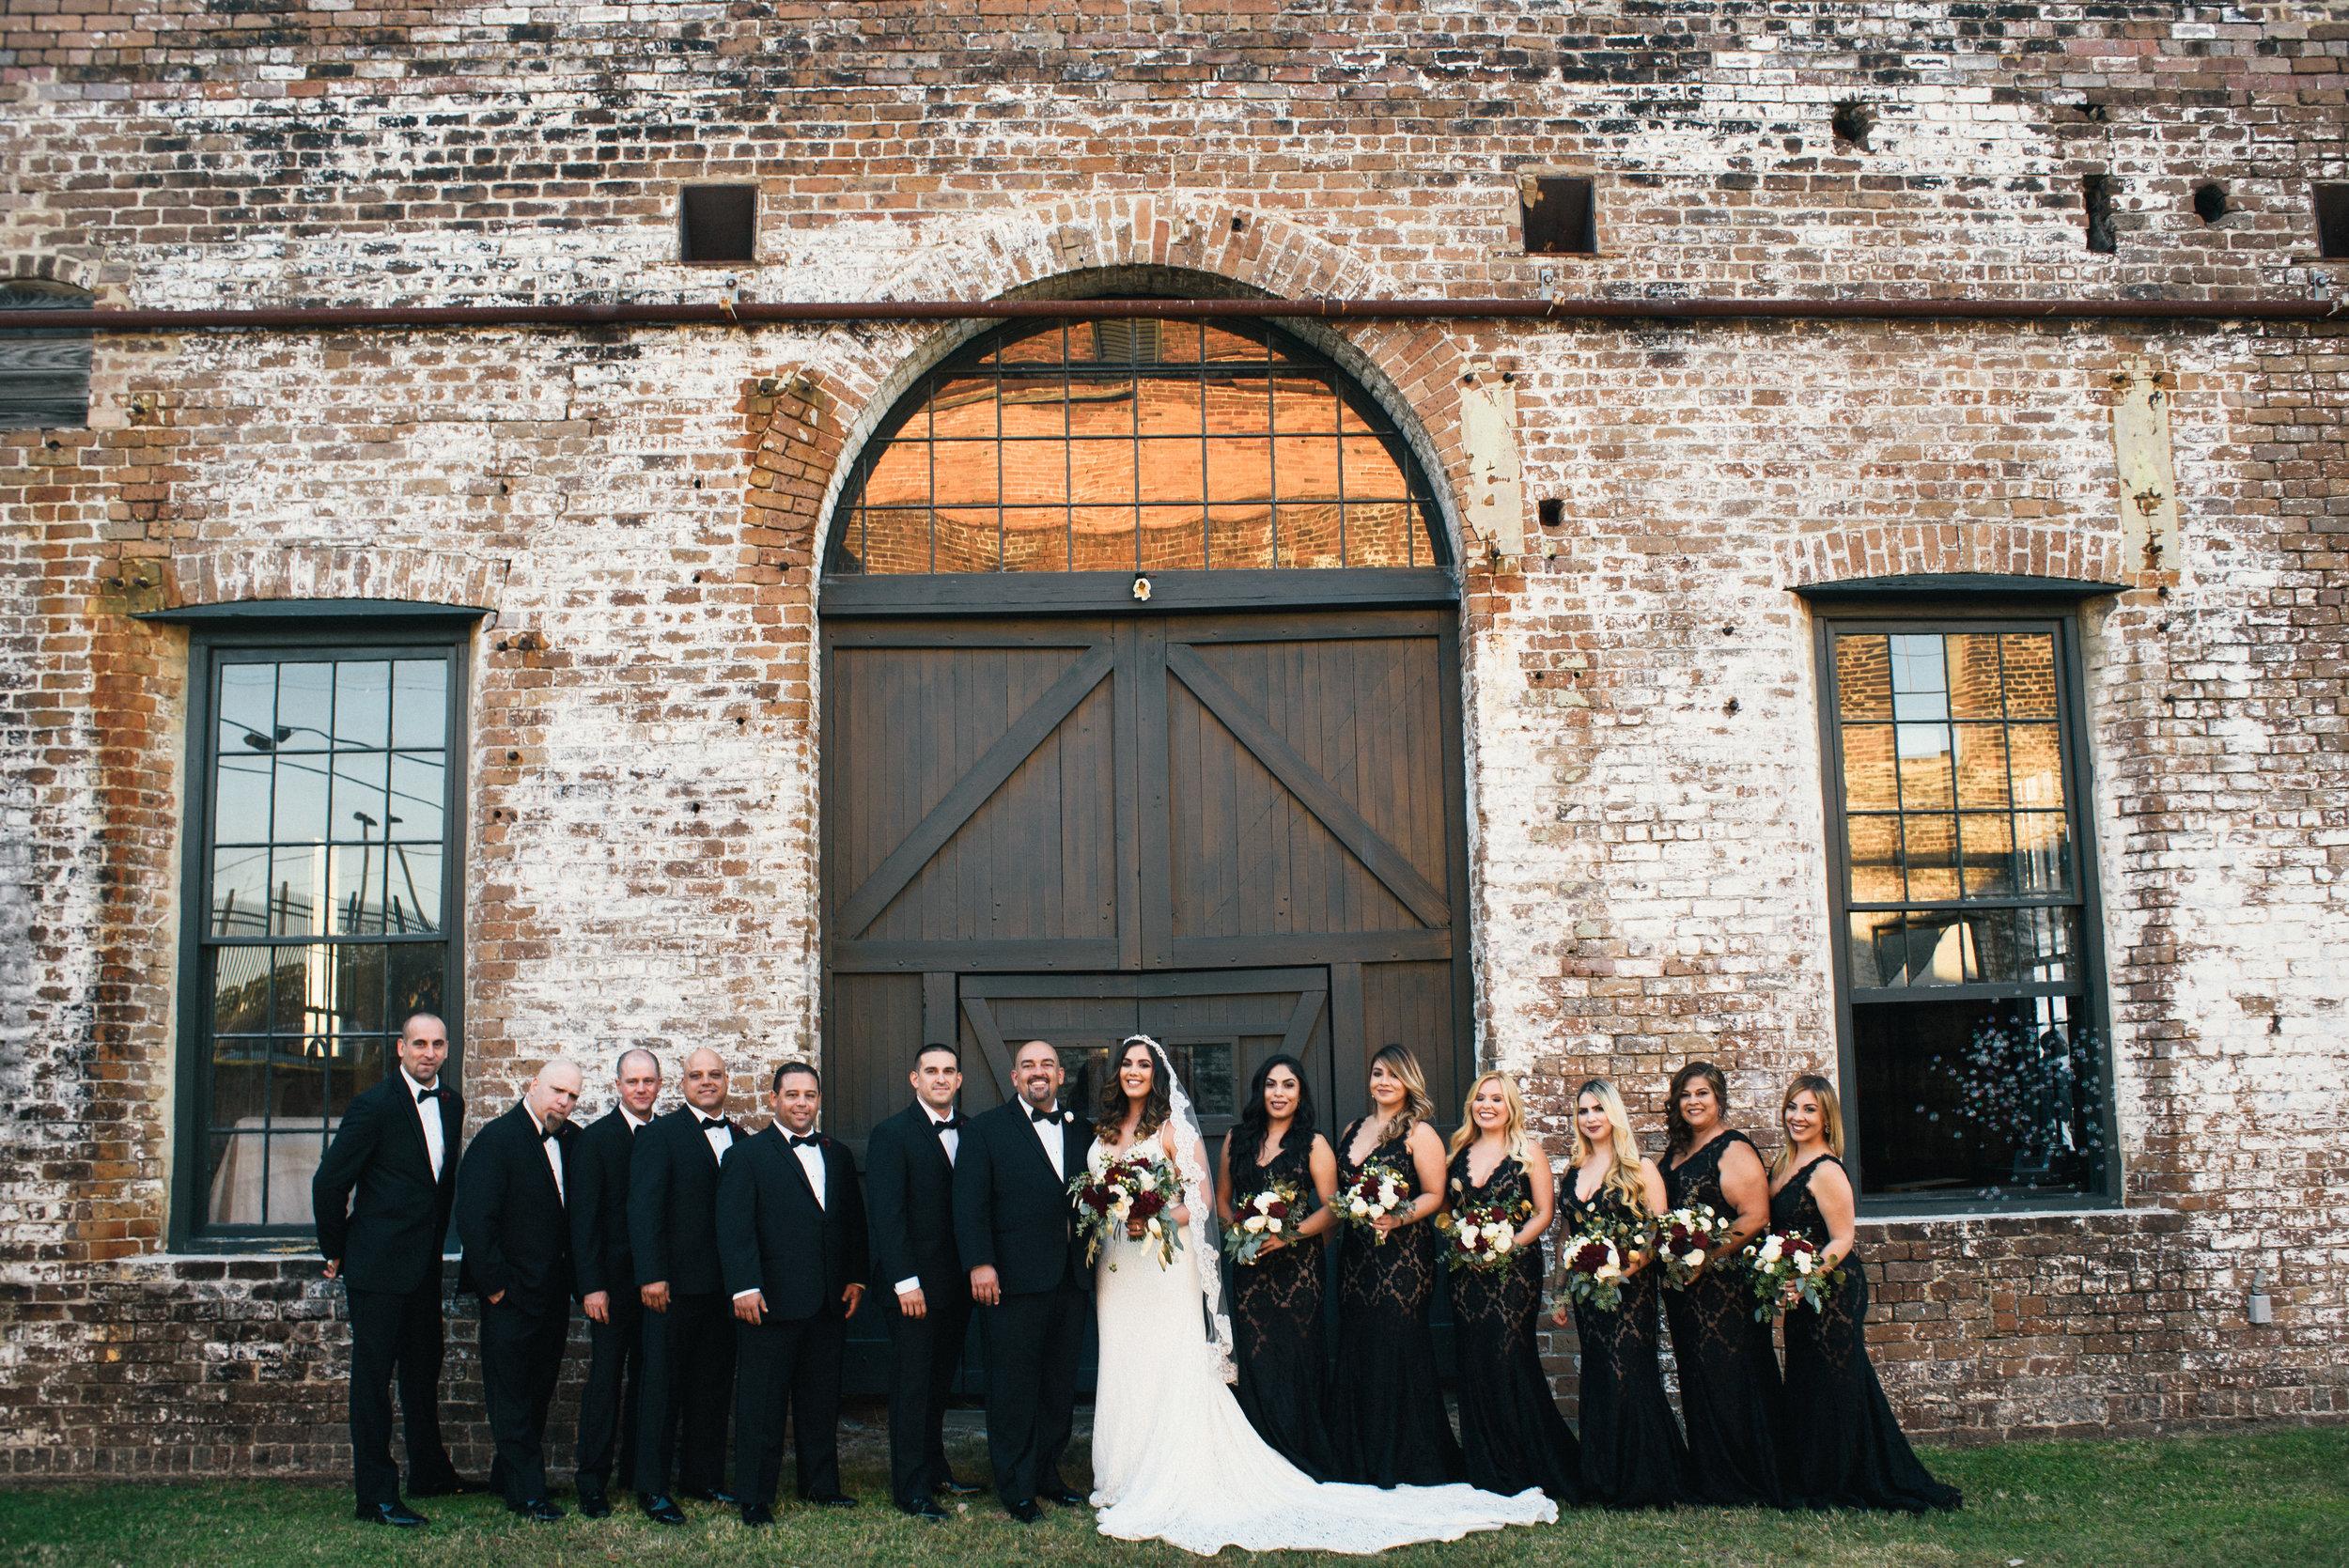 Iggy-and-yesenia-savannah-railroad-museum-wedding-meg-hill-photo- (607 of 1037).jpg